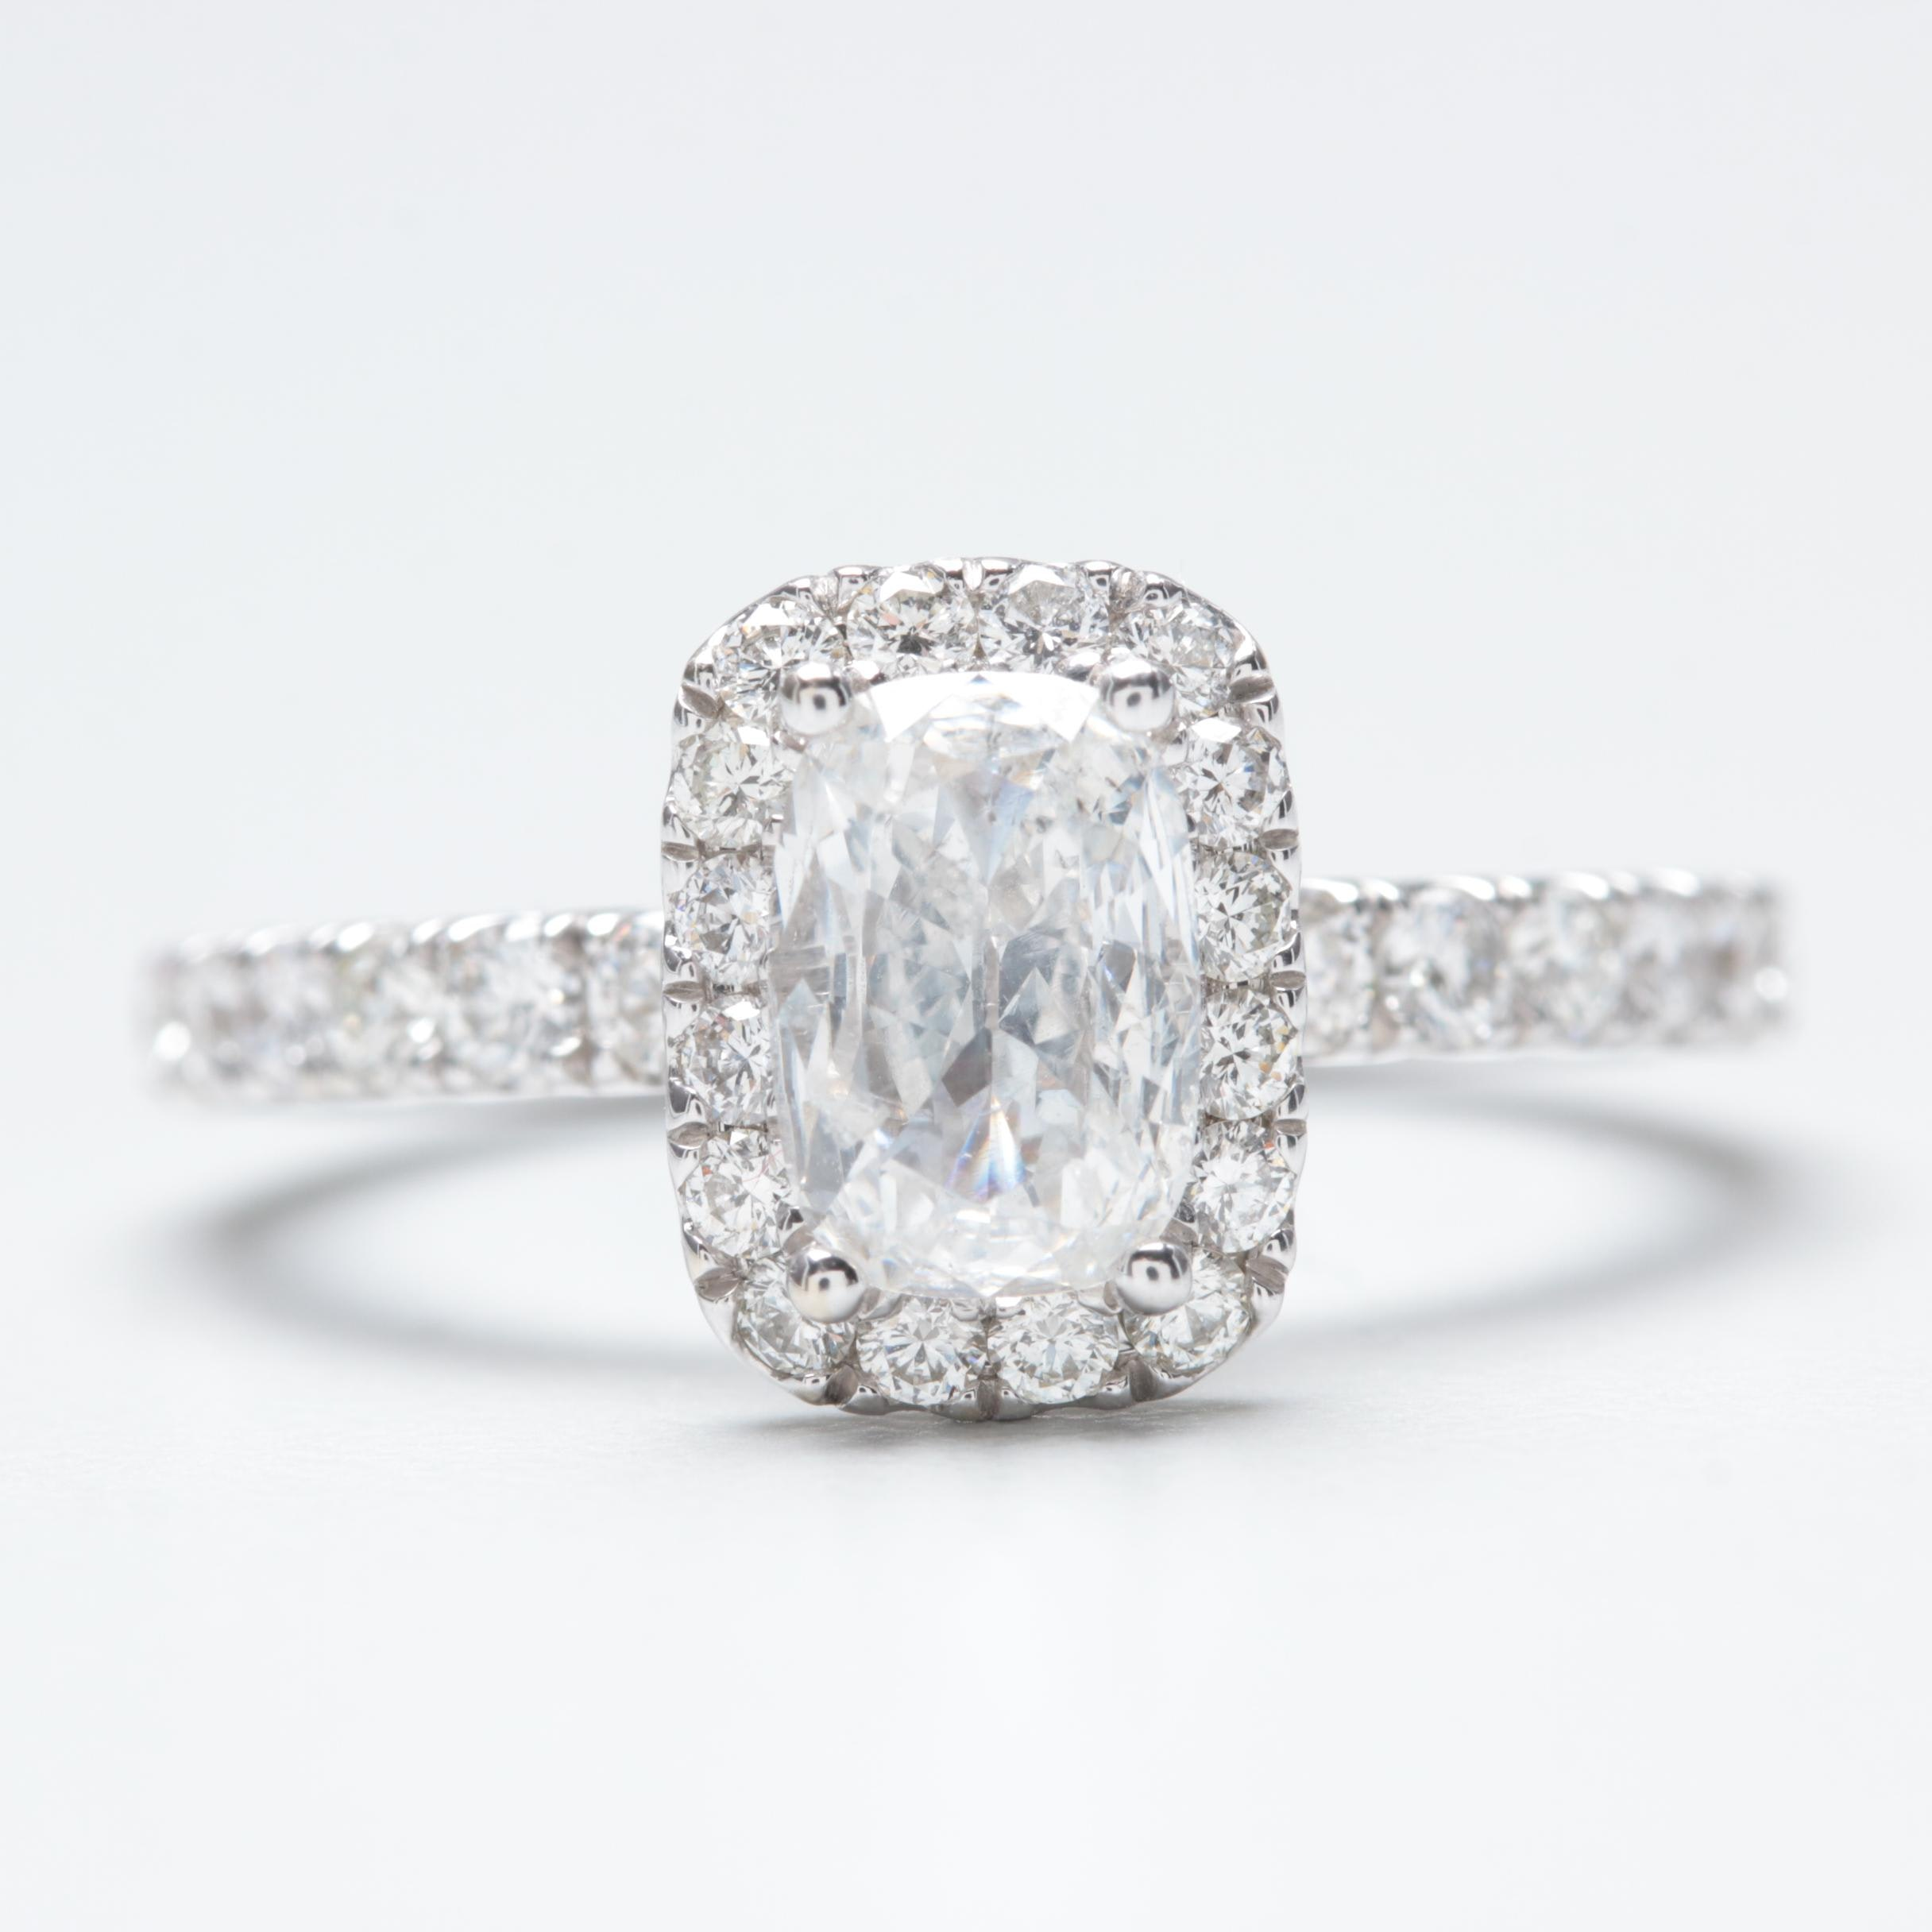 14K White Gold 1.38 CTW Diamond Ring